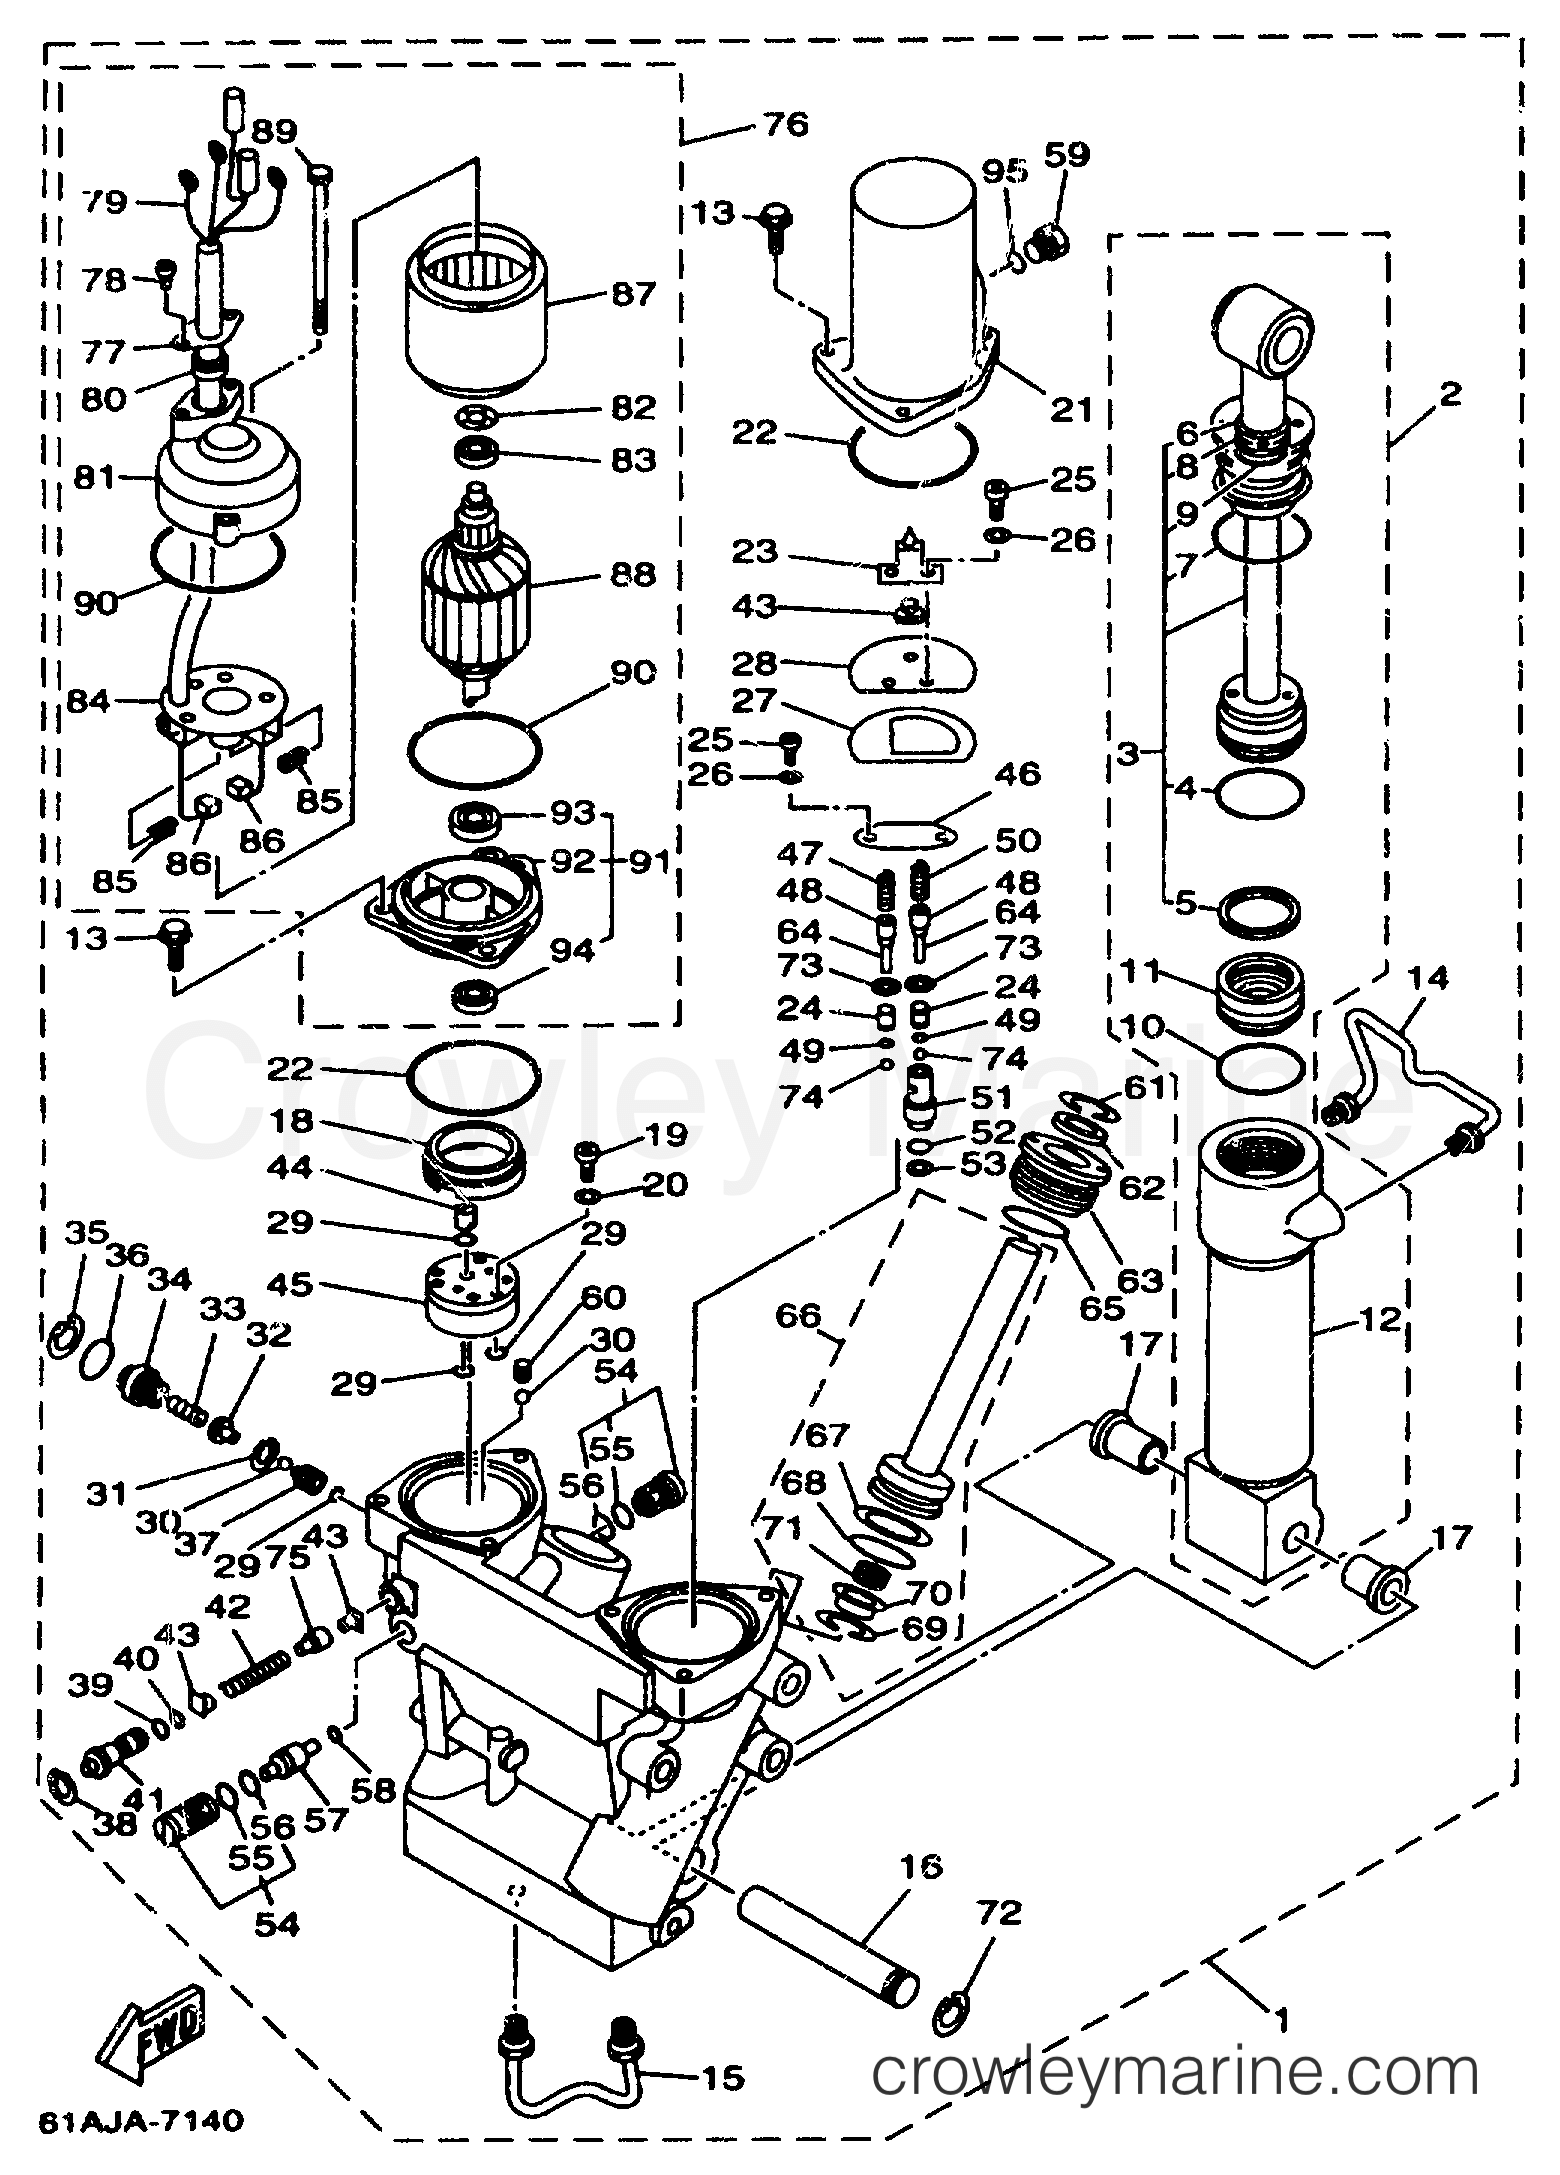 POWER TRIM TILT ASSEMBLY 1 - 1998 Yamaha Outboard 225hp ...